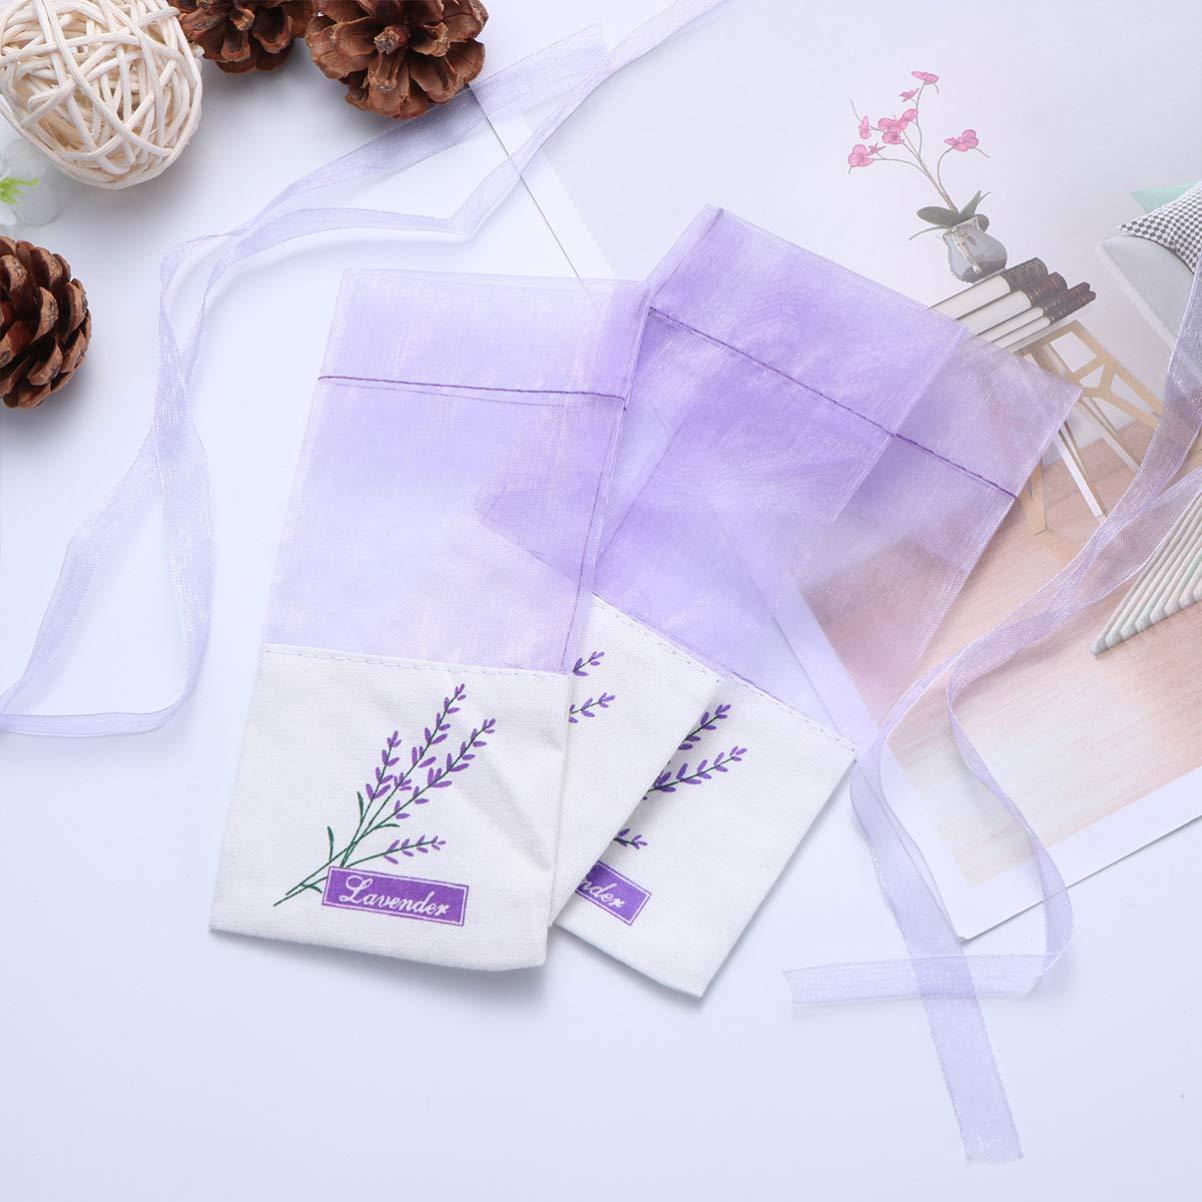 TOPBATHY 10pcs Sachet Empty Bags Purple Drawstring Gauze Sachets Bag for Lavender Spice and Herbs